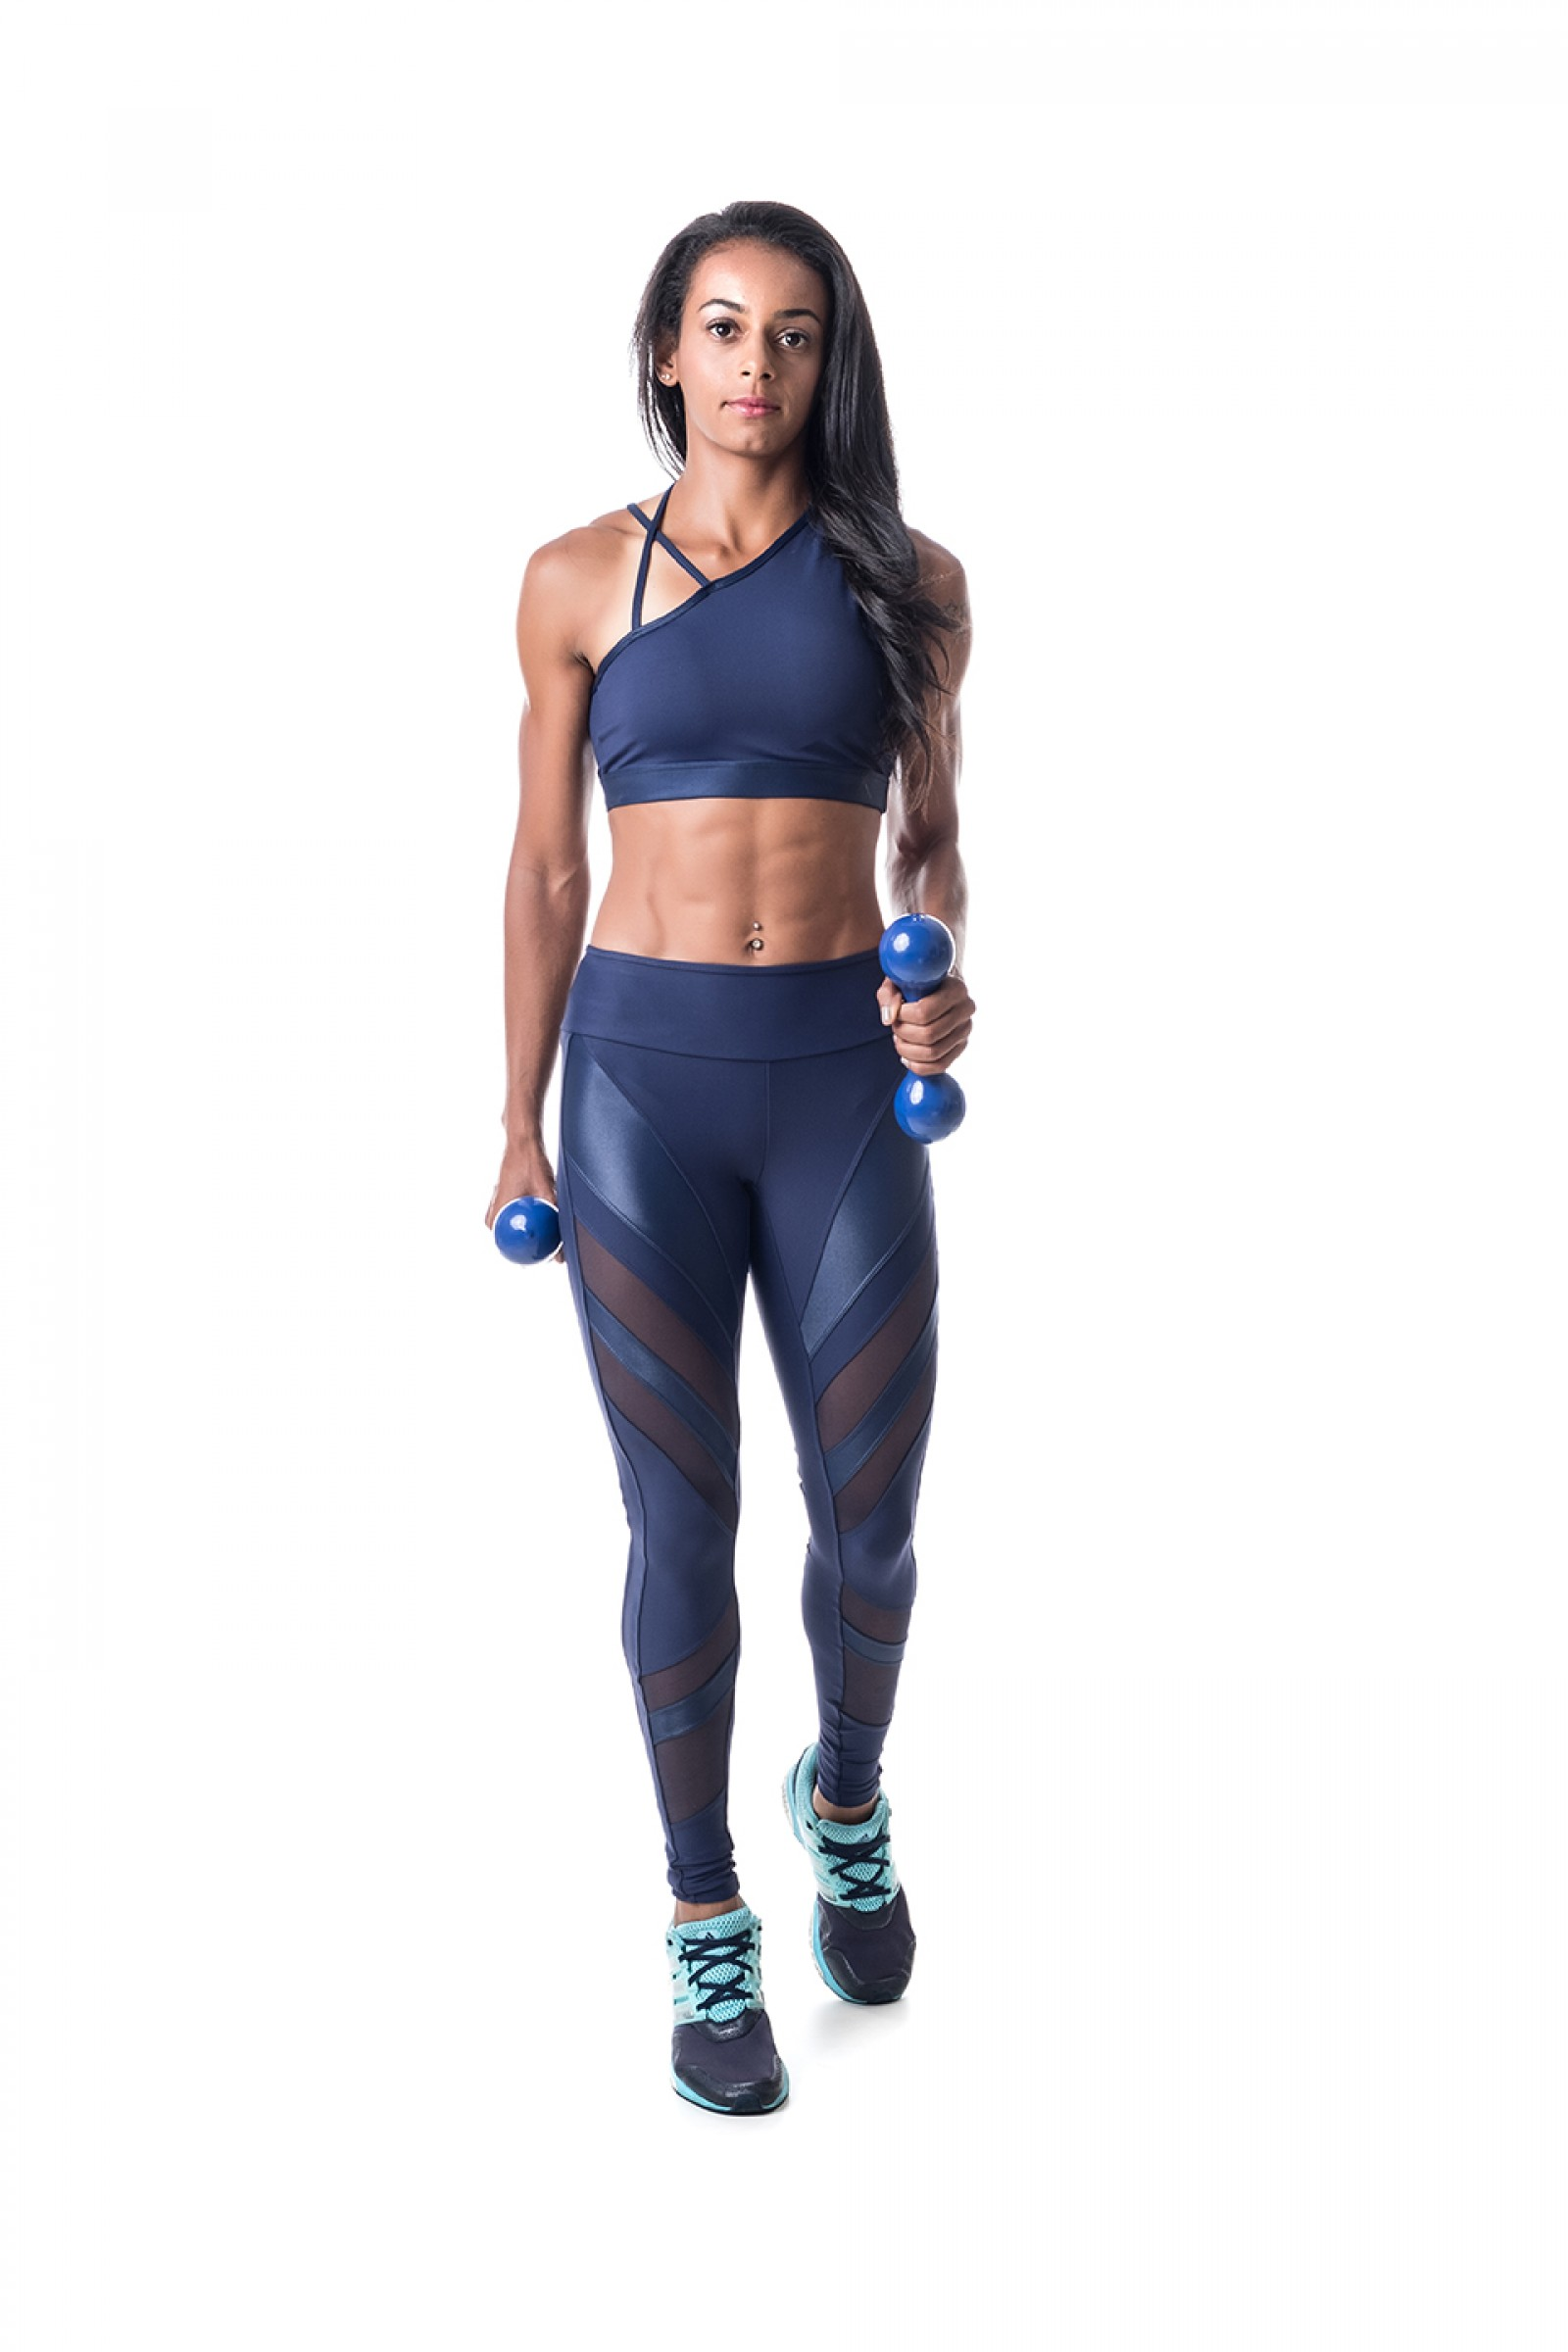 Top Instigate Marinho, Coleção Challenge - NKT Fitwear Moda Fitness